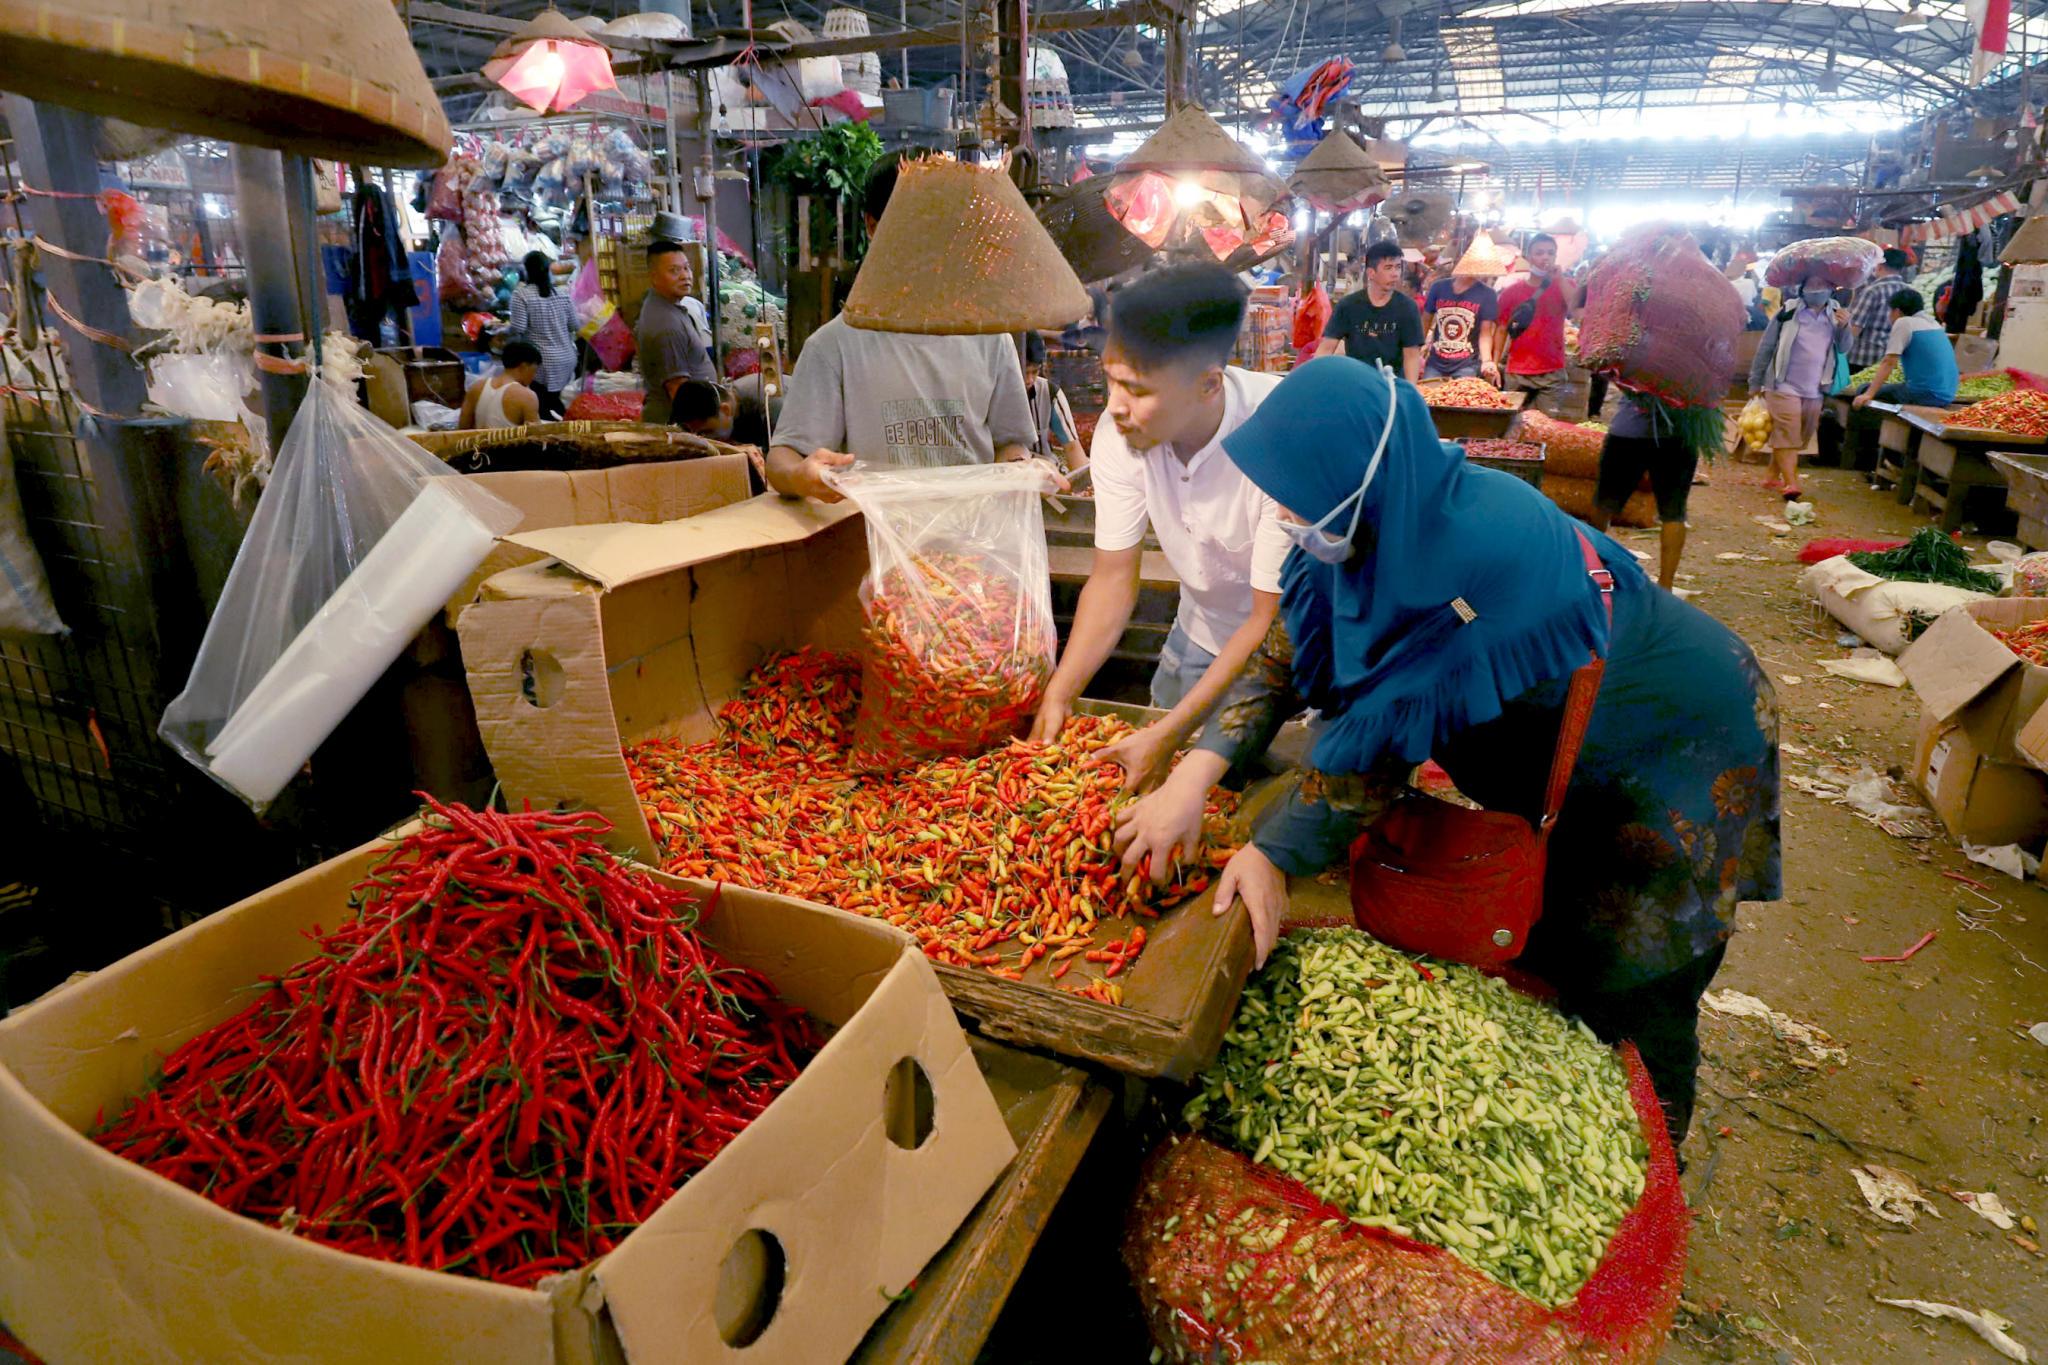 Memasuki Ramadan, Kemendag Lansir Harga Rata-rata Sembako di 216 Pasar Rakyat